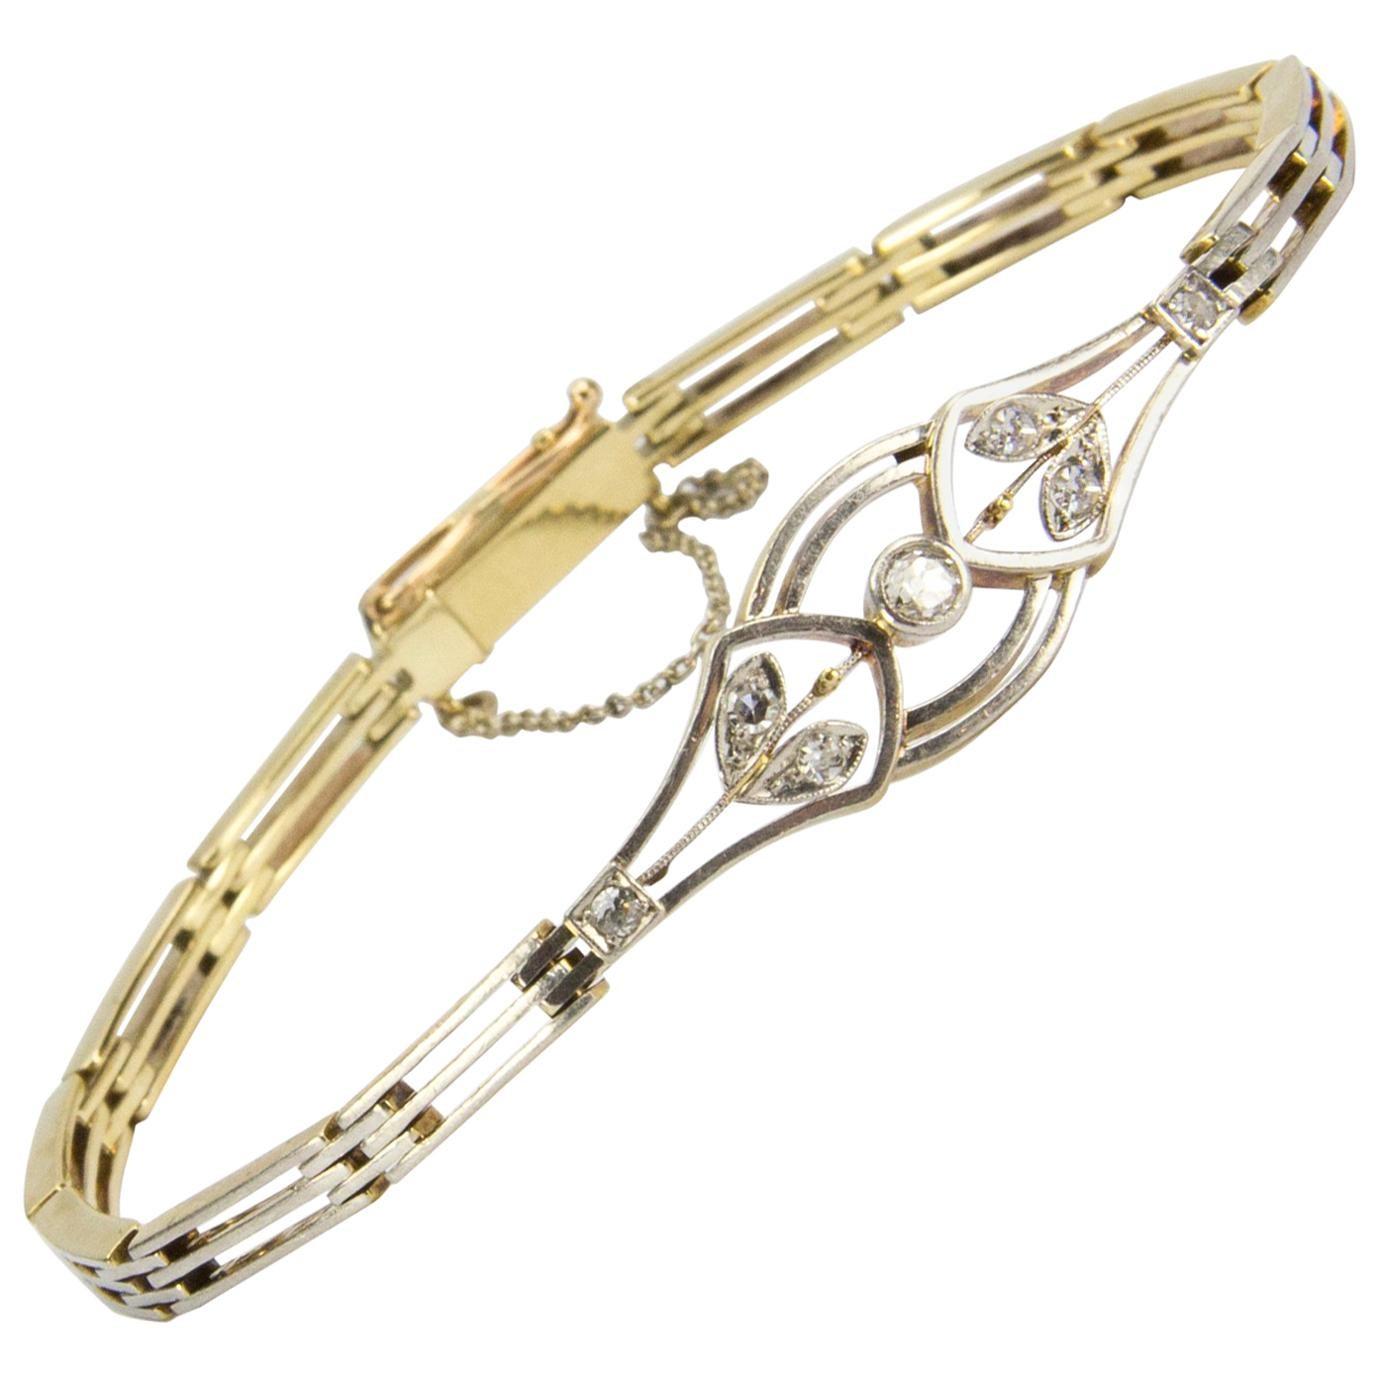 0c8b41b6f09 Birks of Canada Ram's Head Gold and Jade Bangle Bracelet at 1stdibs